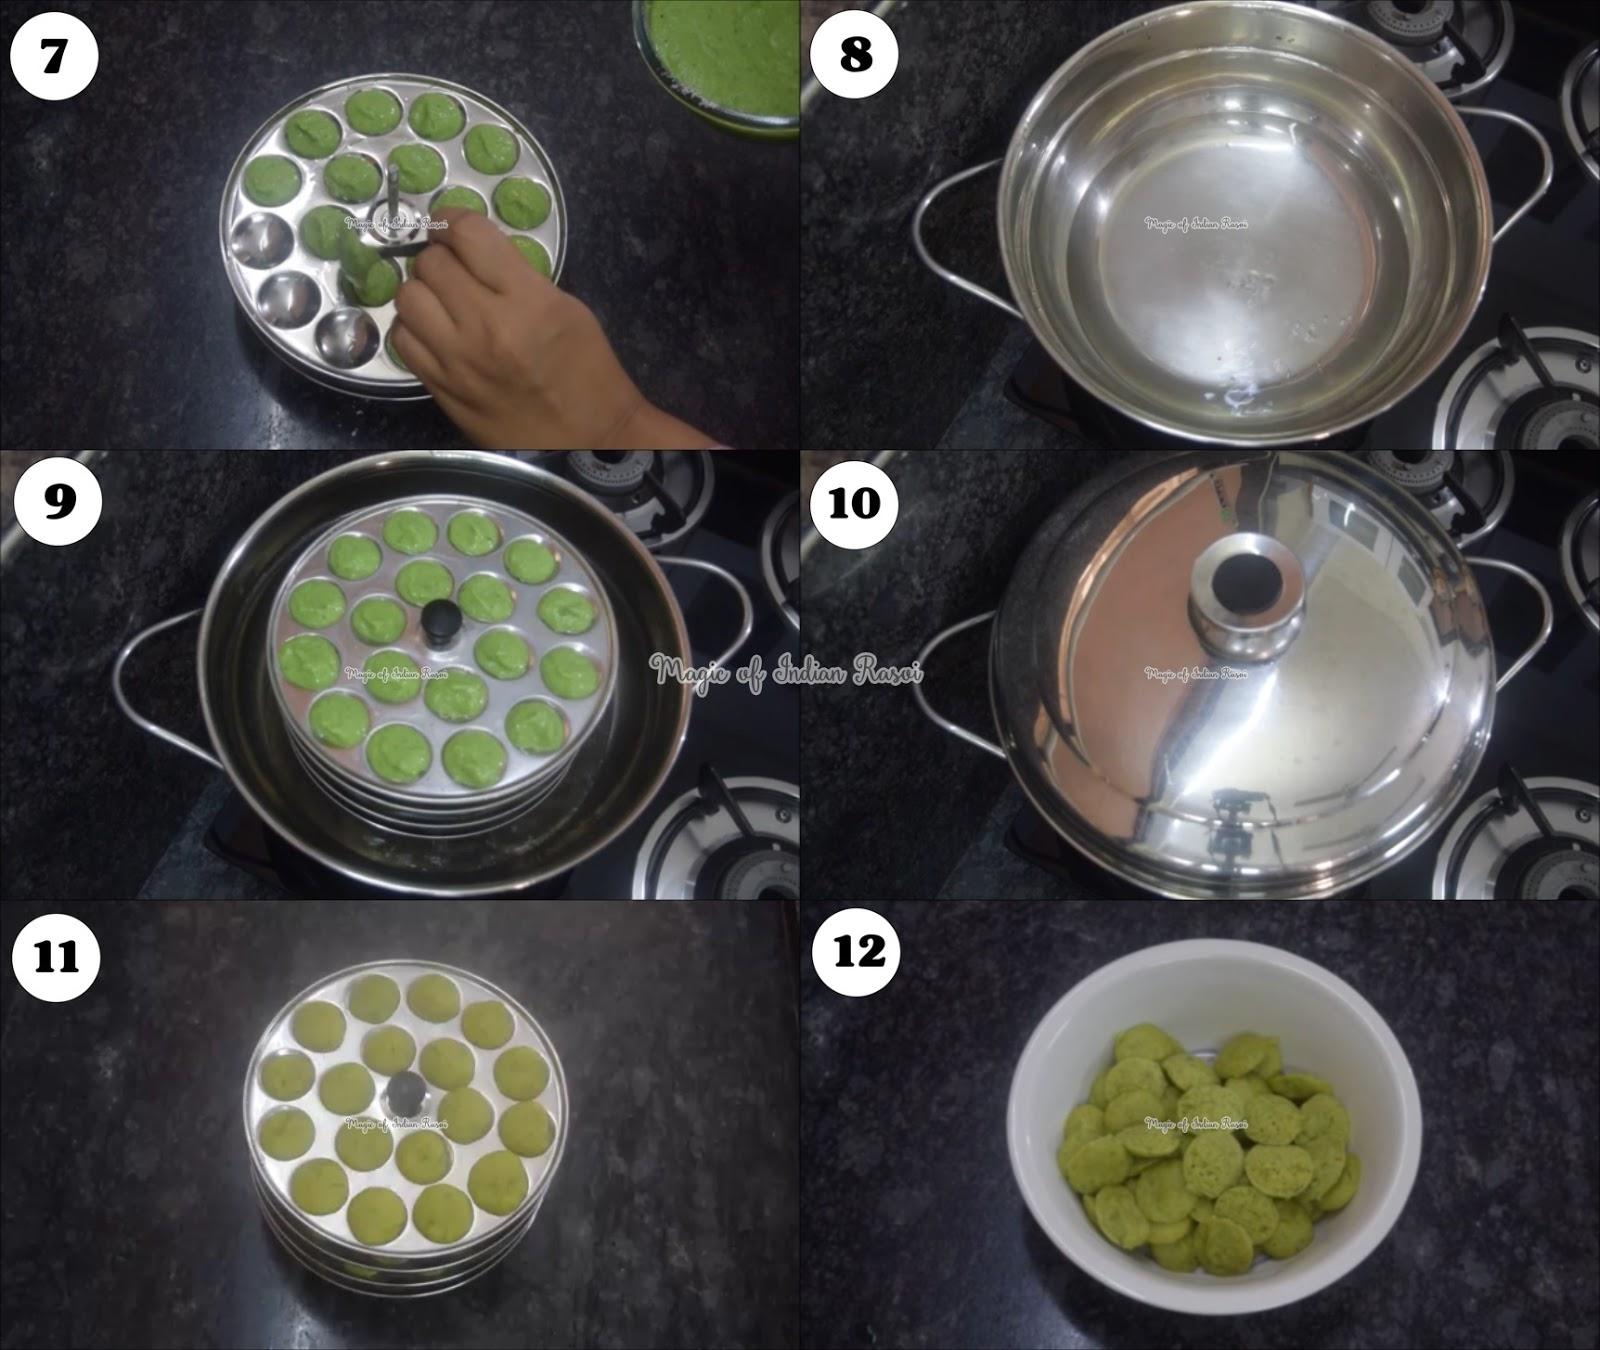 Mini Cocktail Hariyali Idli Recipe - मिनी कॉकटेल ग्रीन इडली रेसिपी - Priya R - Magic of Indian Rasoi